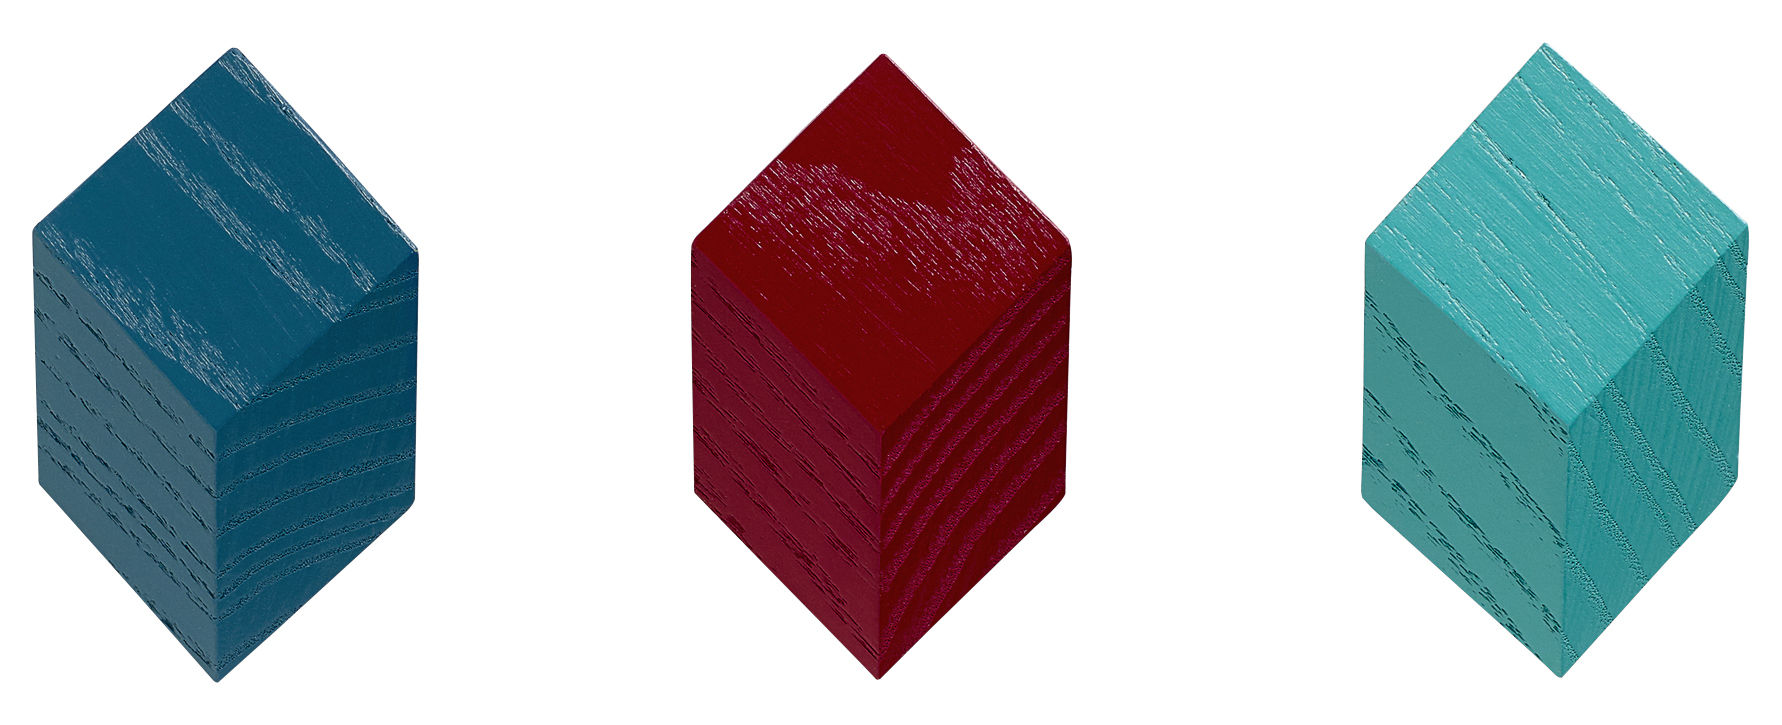 Furniture - Coat Racks & Pegs - Iso Hook - Set of 3 by Hay - Red / Green - Painted ashwoodwood